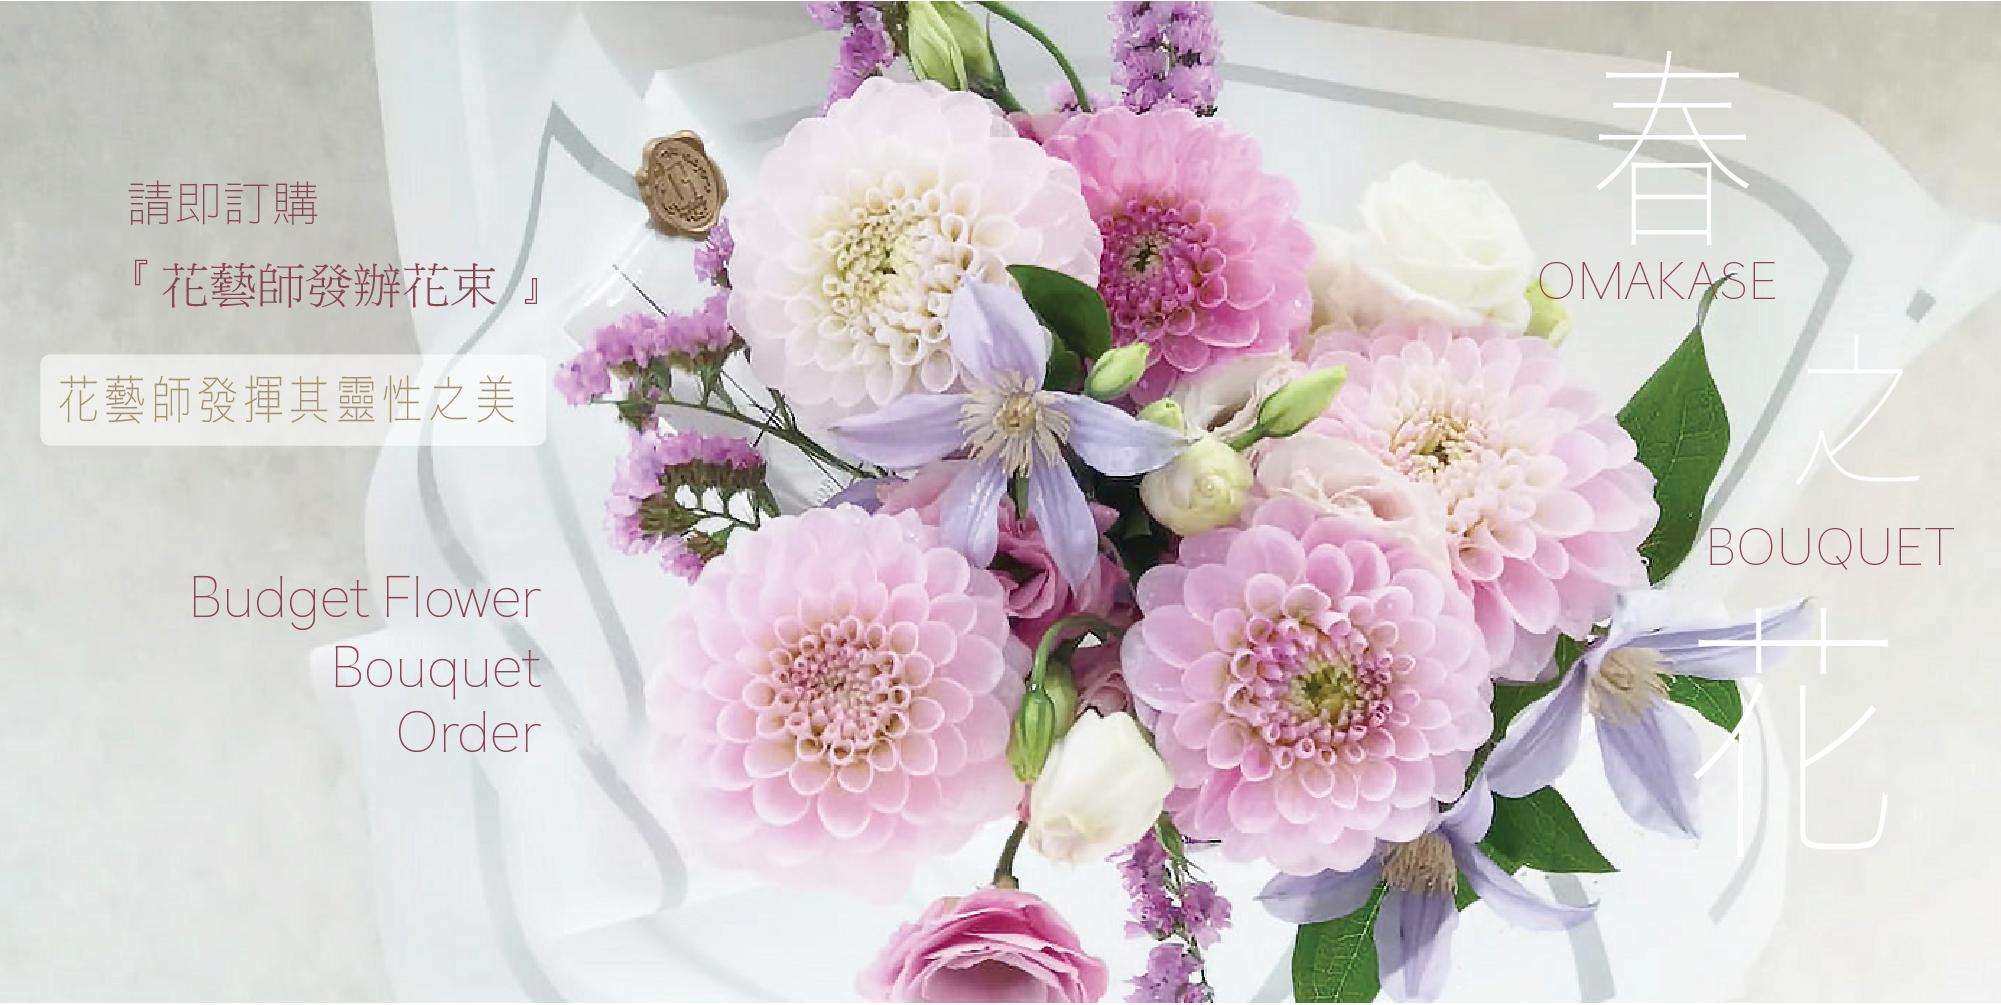 https://www.falovers.com.hk/products/omakase-bouquet-om001